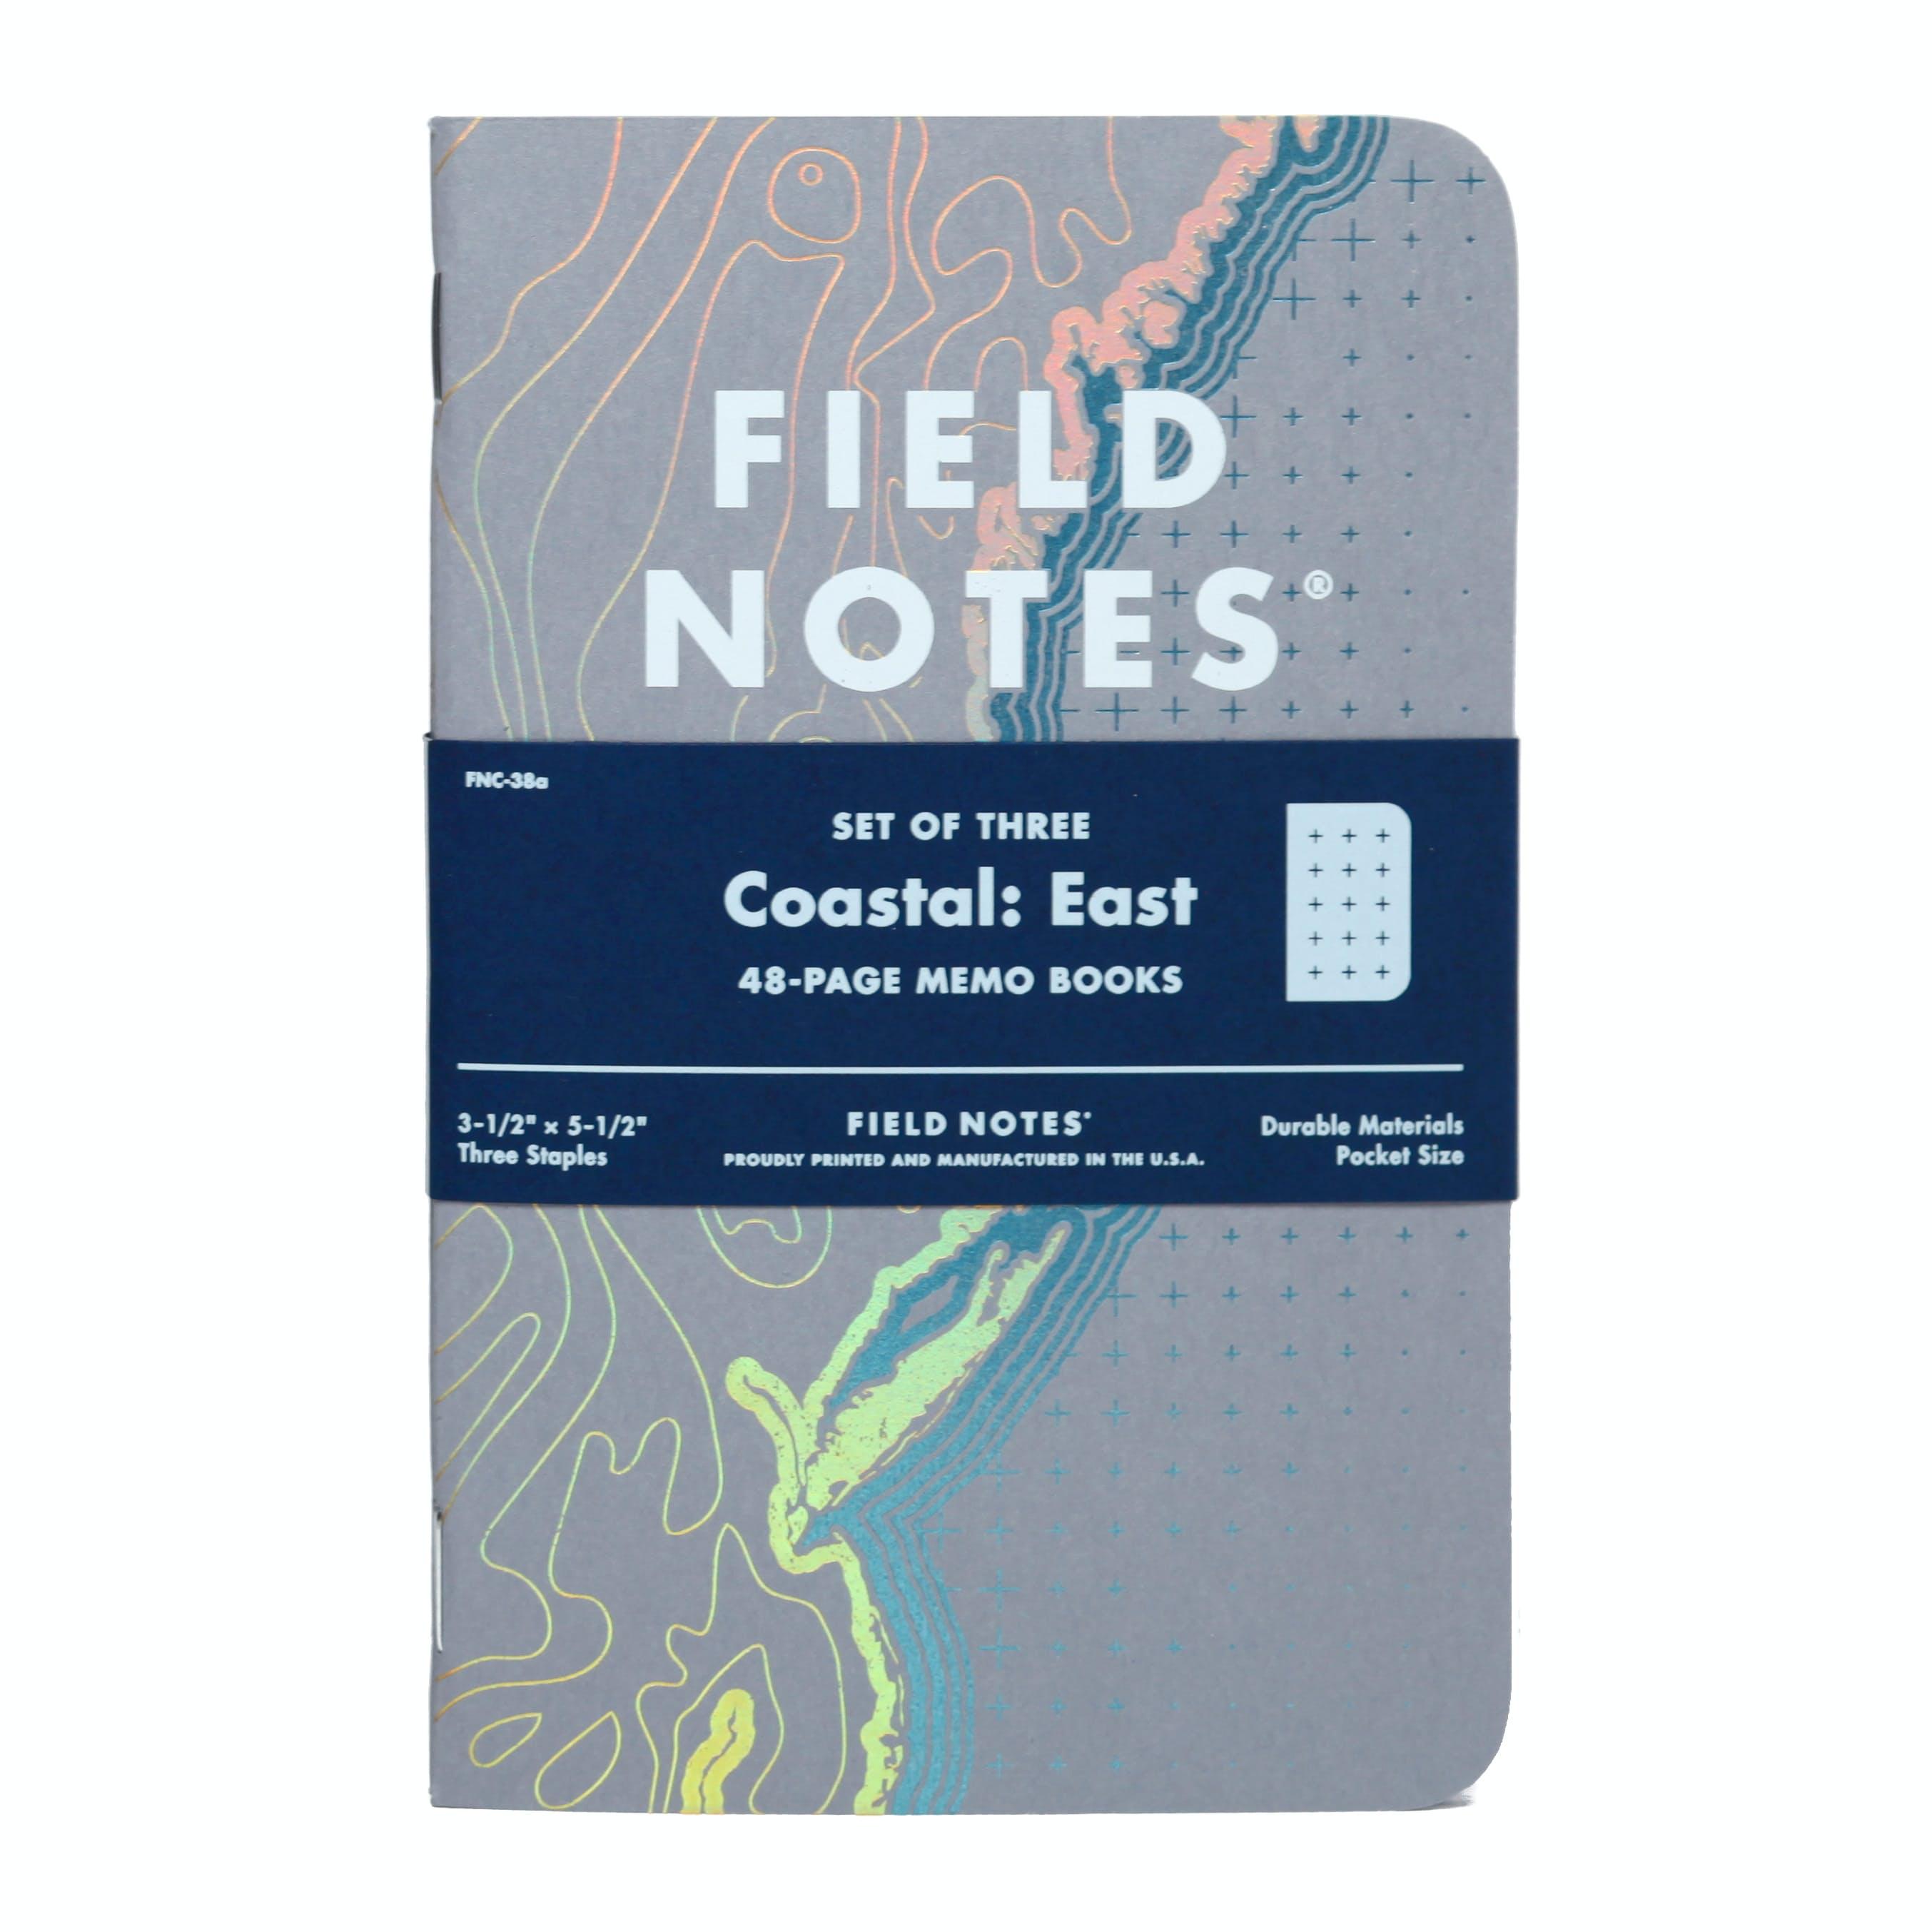 Qas41aiftz field notes coastal east 3 pack limited edition 0 original